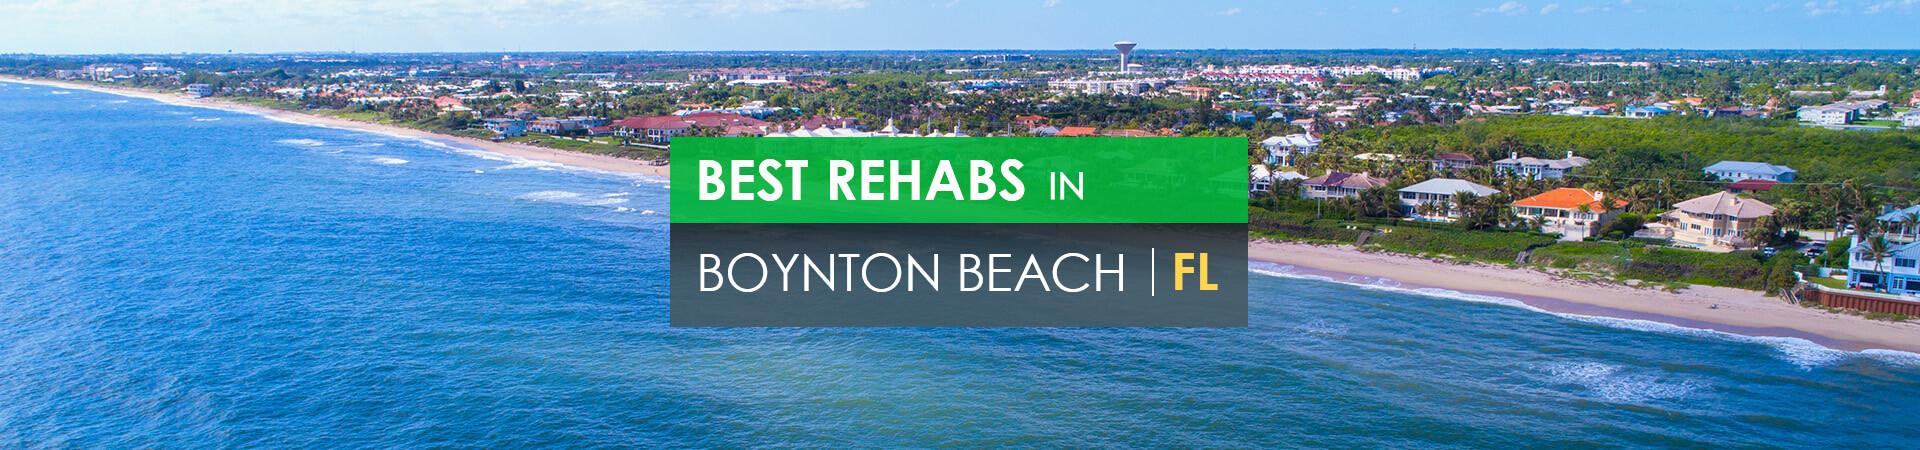 Best rehabs in Boynton Beach, FL